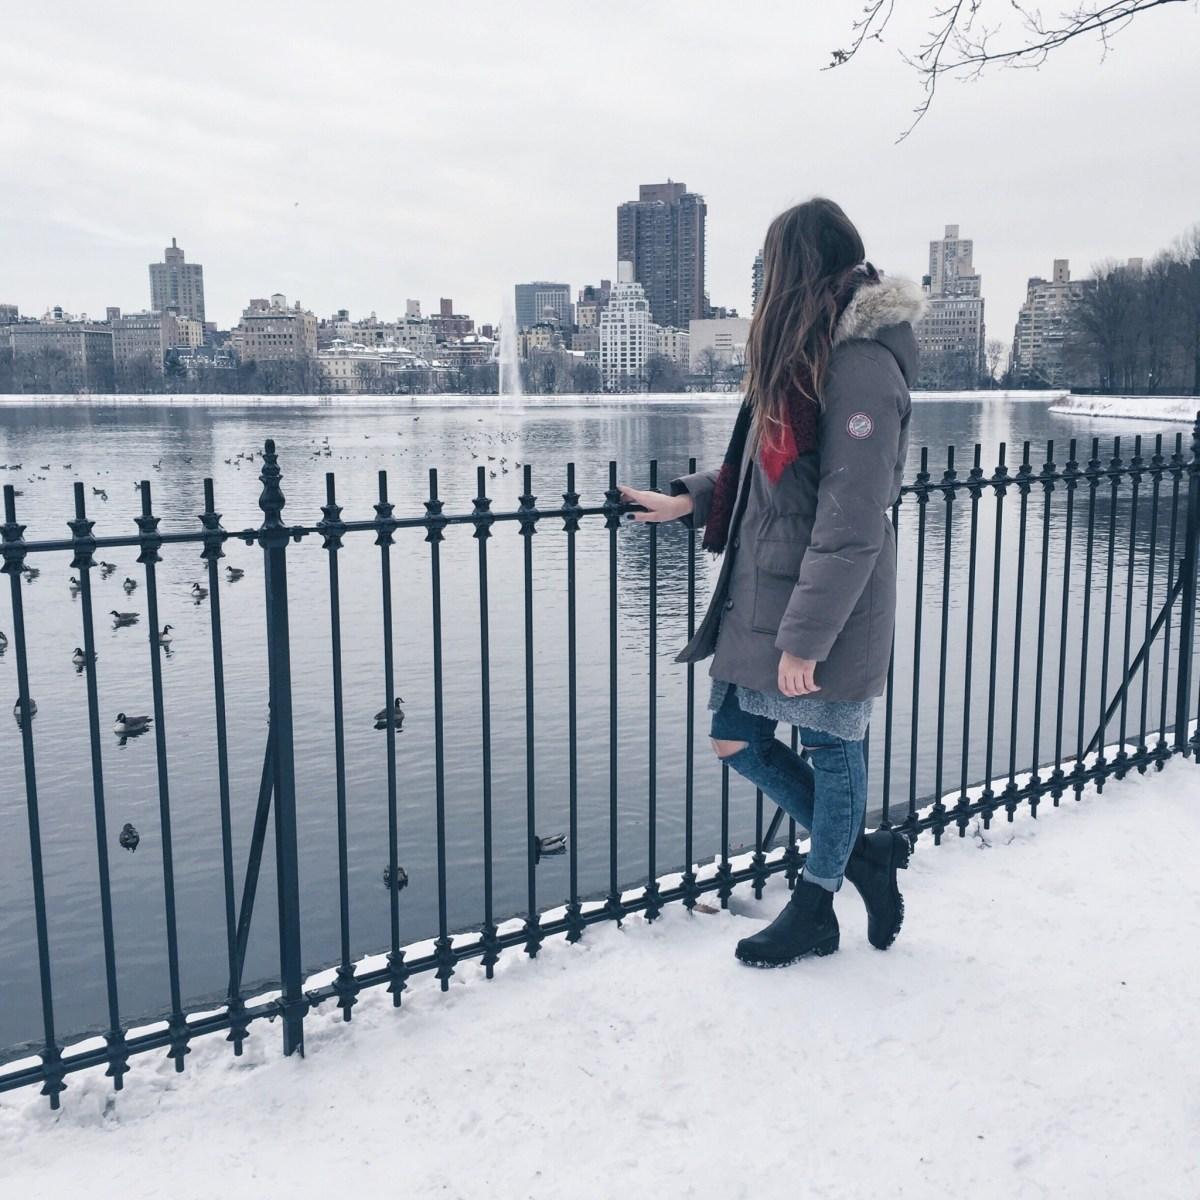 central-park-new york